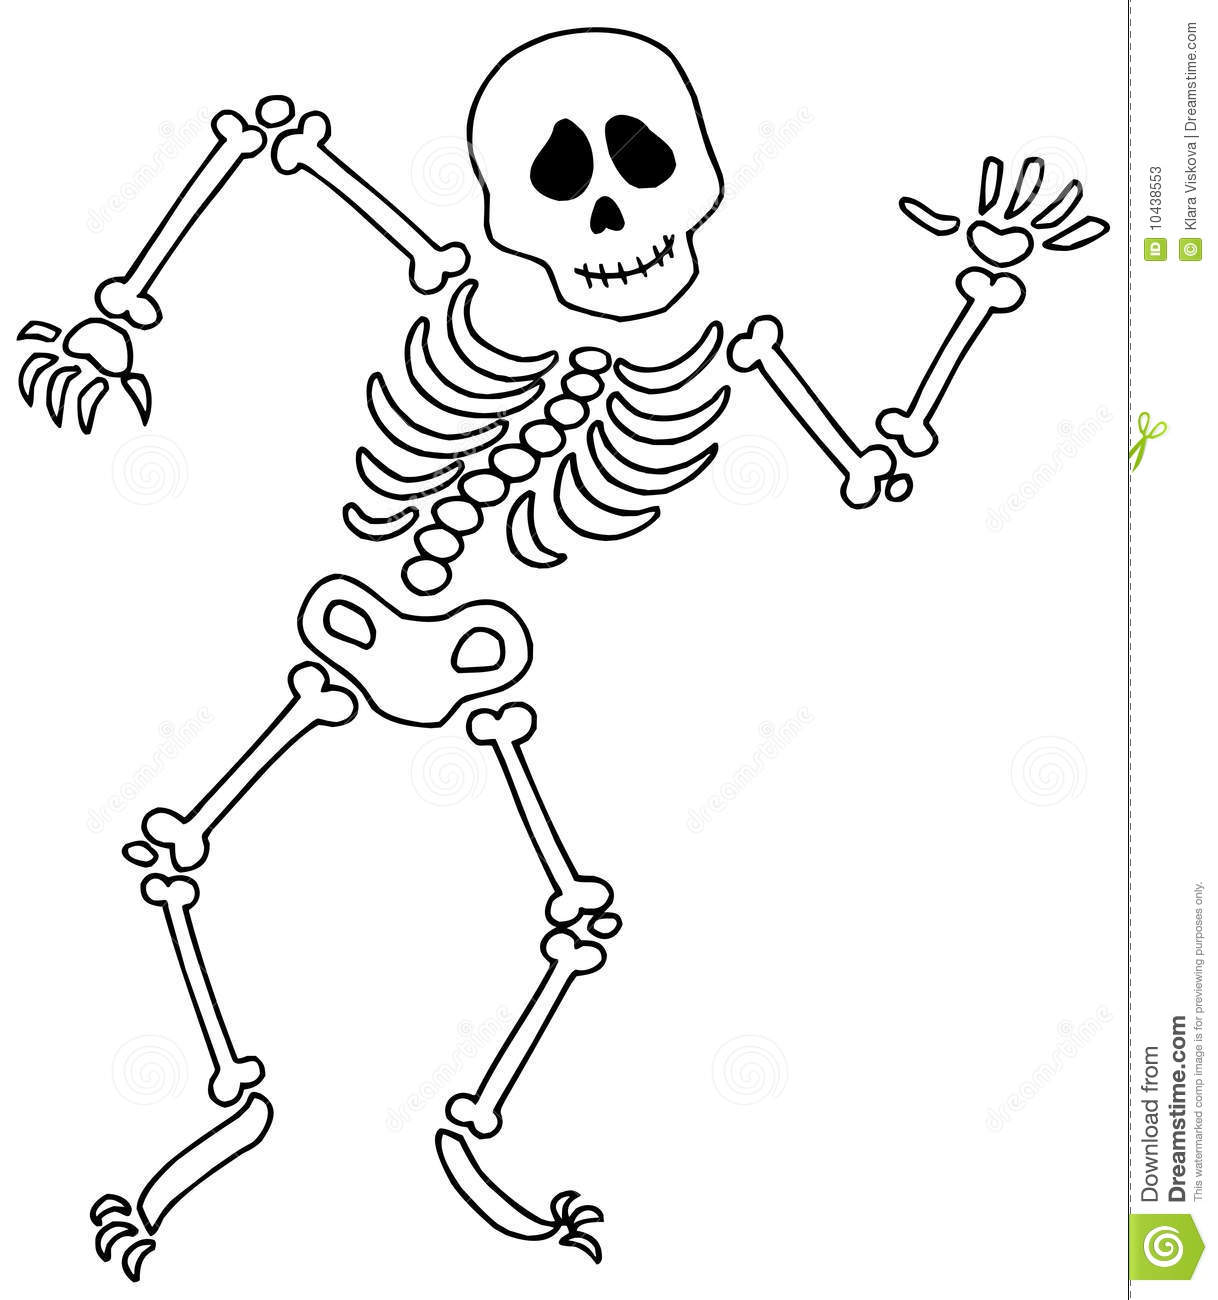 Skeleton clipart #20 Download Skeleton Skeleton clipart